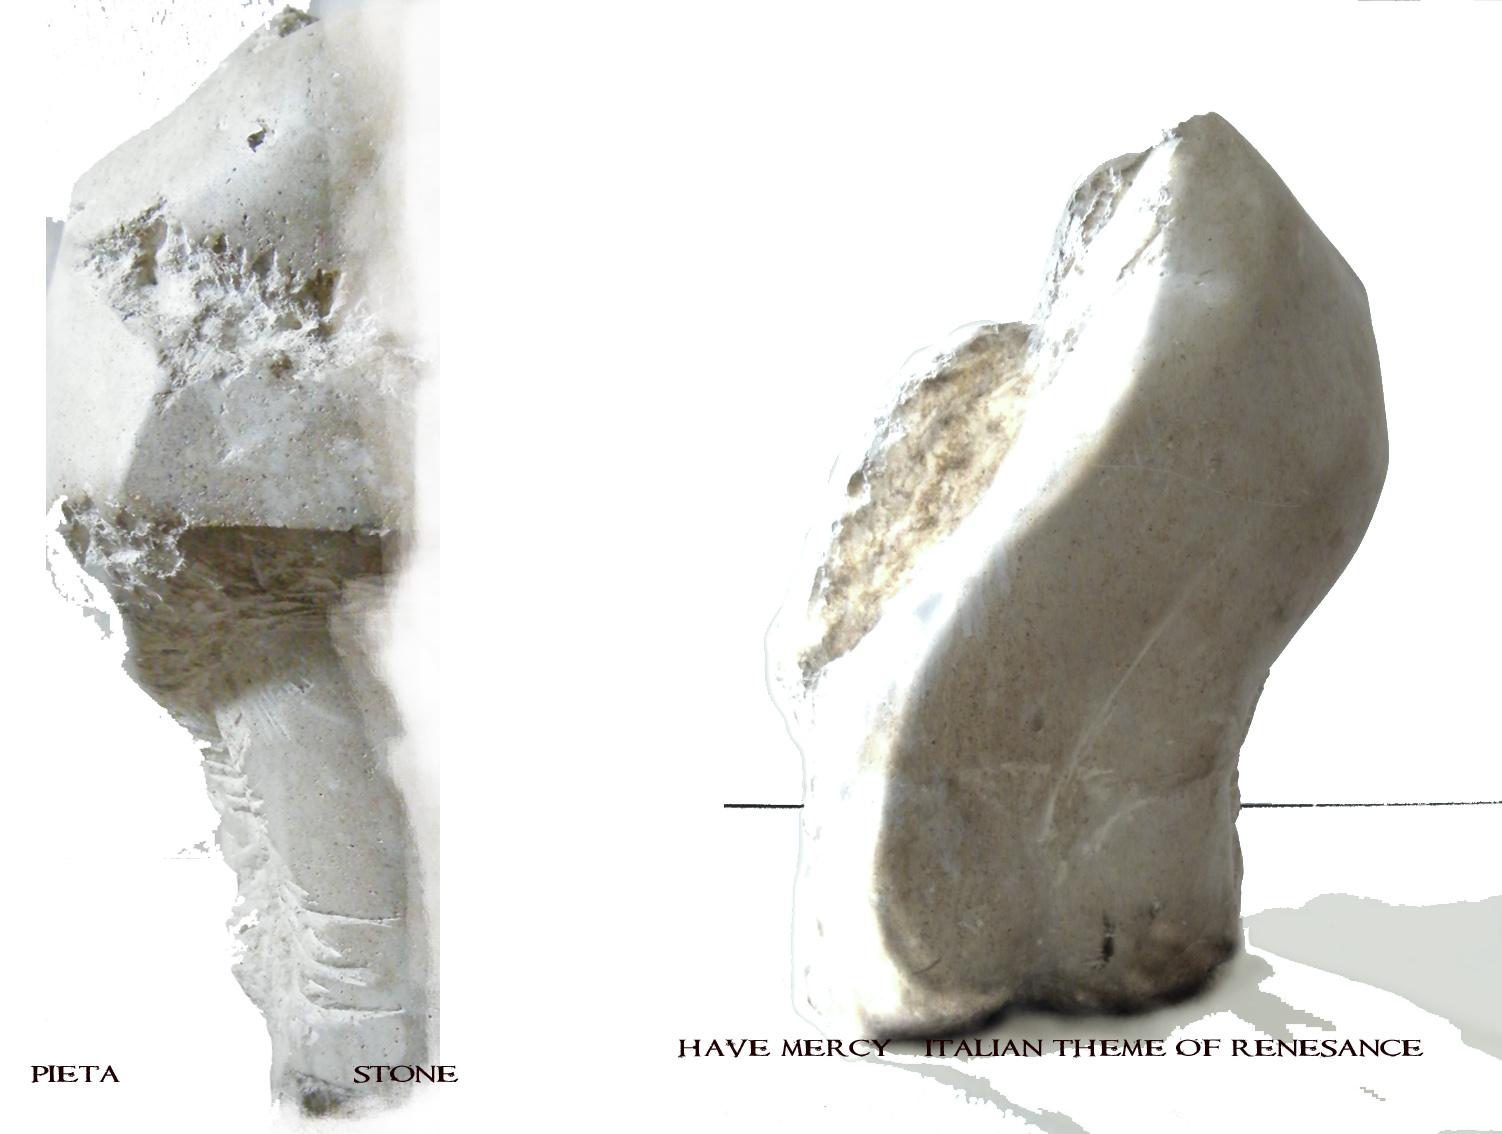 pieta-stone-ioescu-roxana-catalog